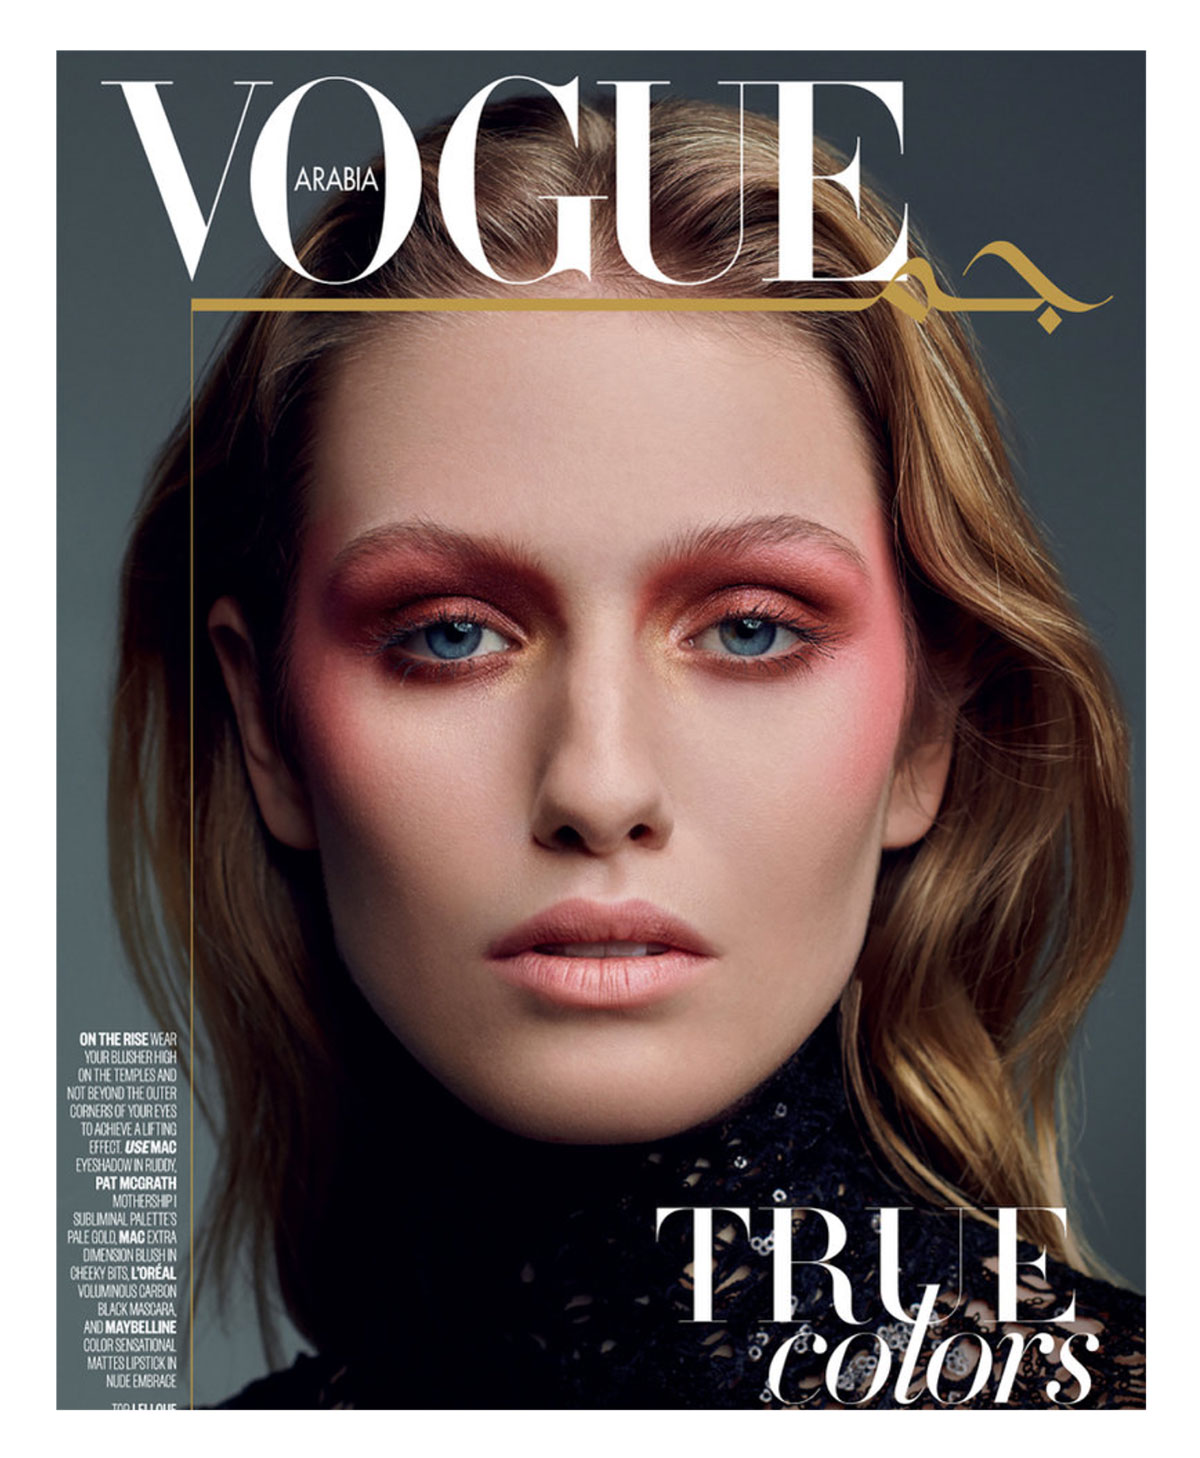 VOGUE Arabia's special on makeup artist Toni Malt's most iconic looks.